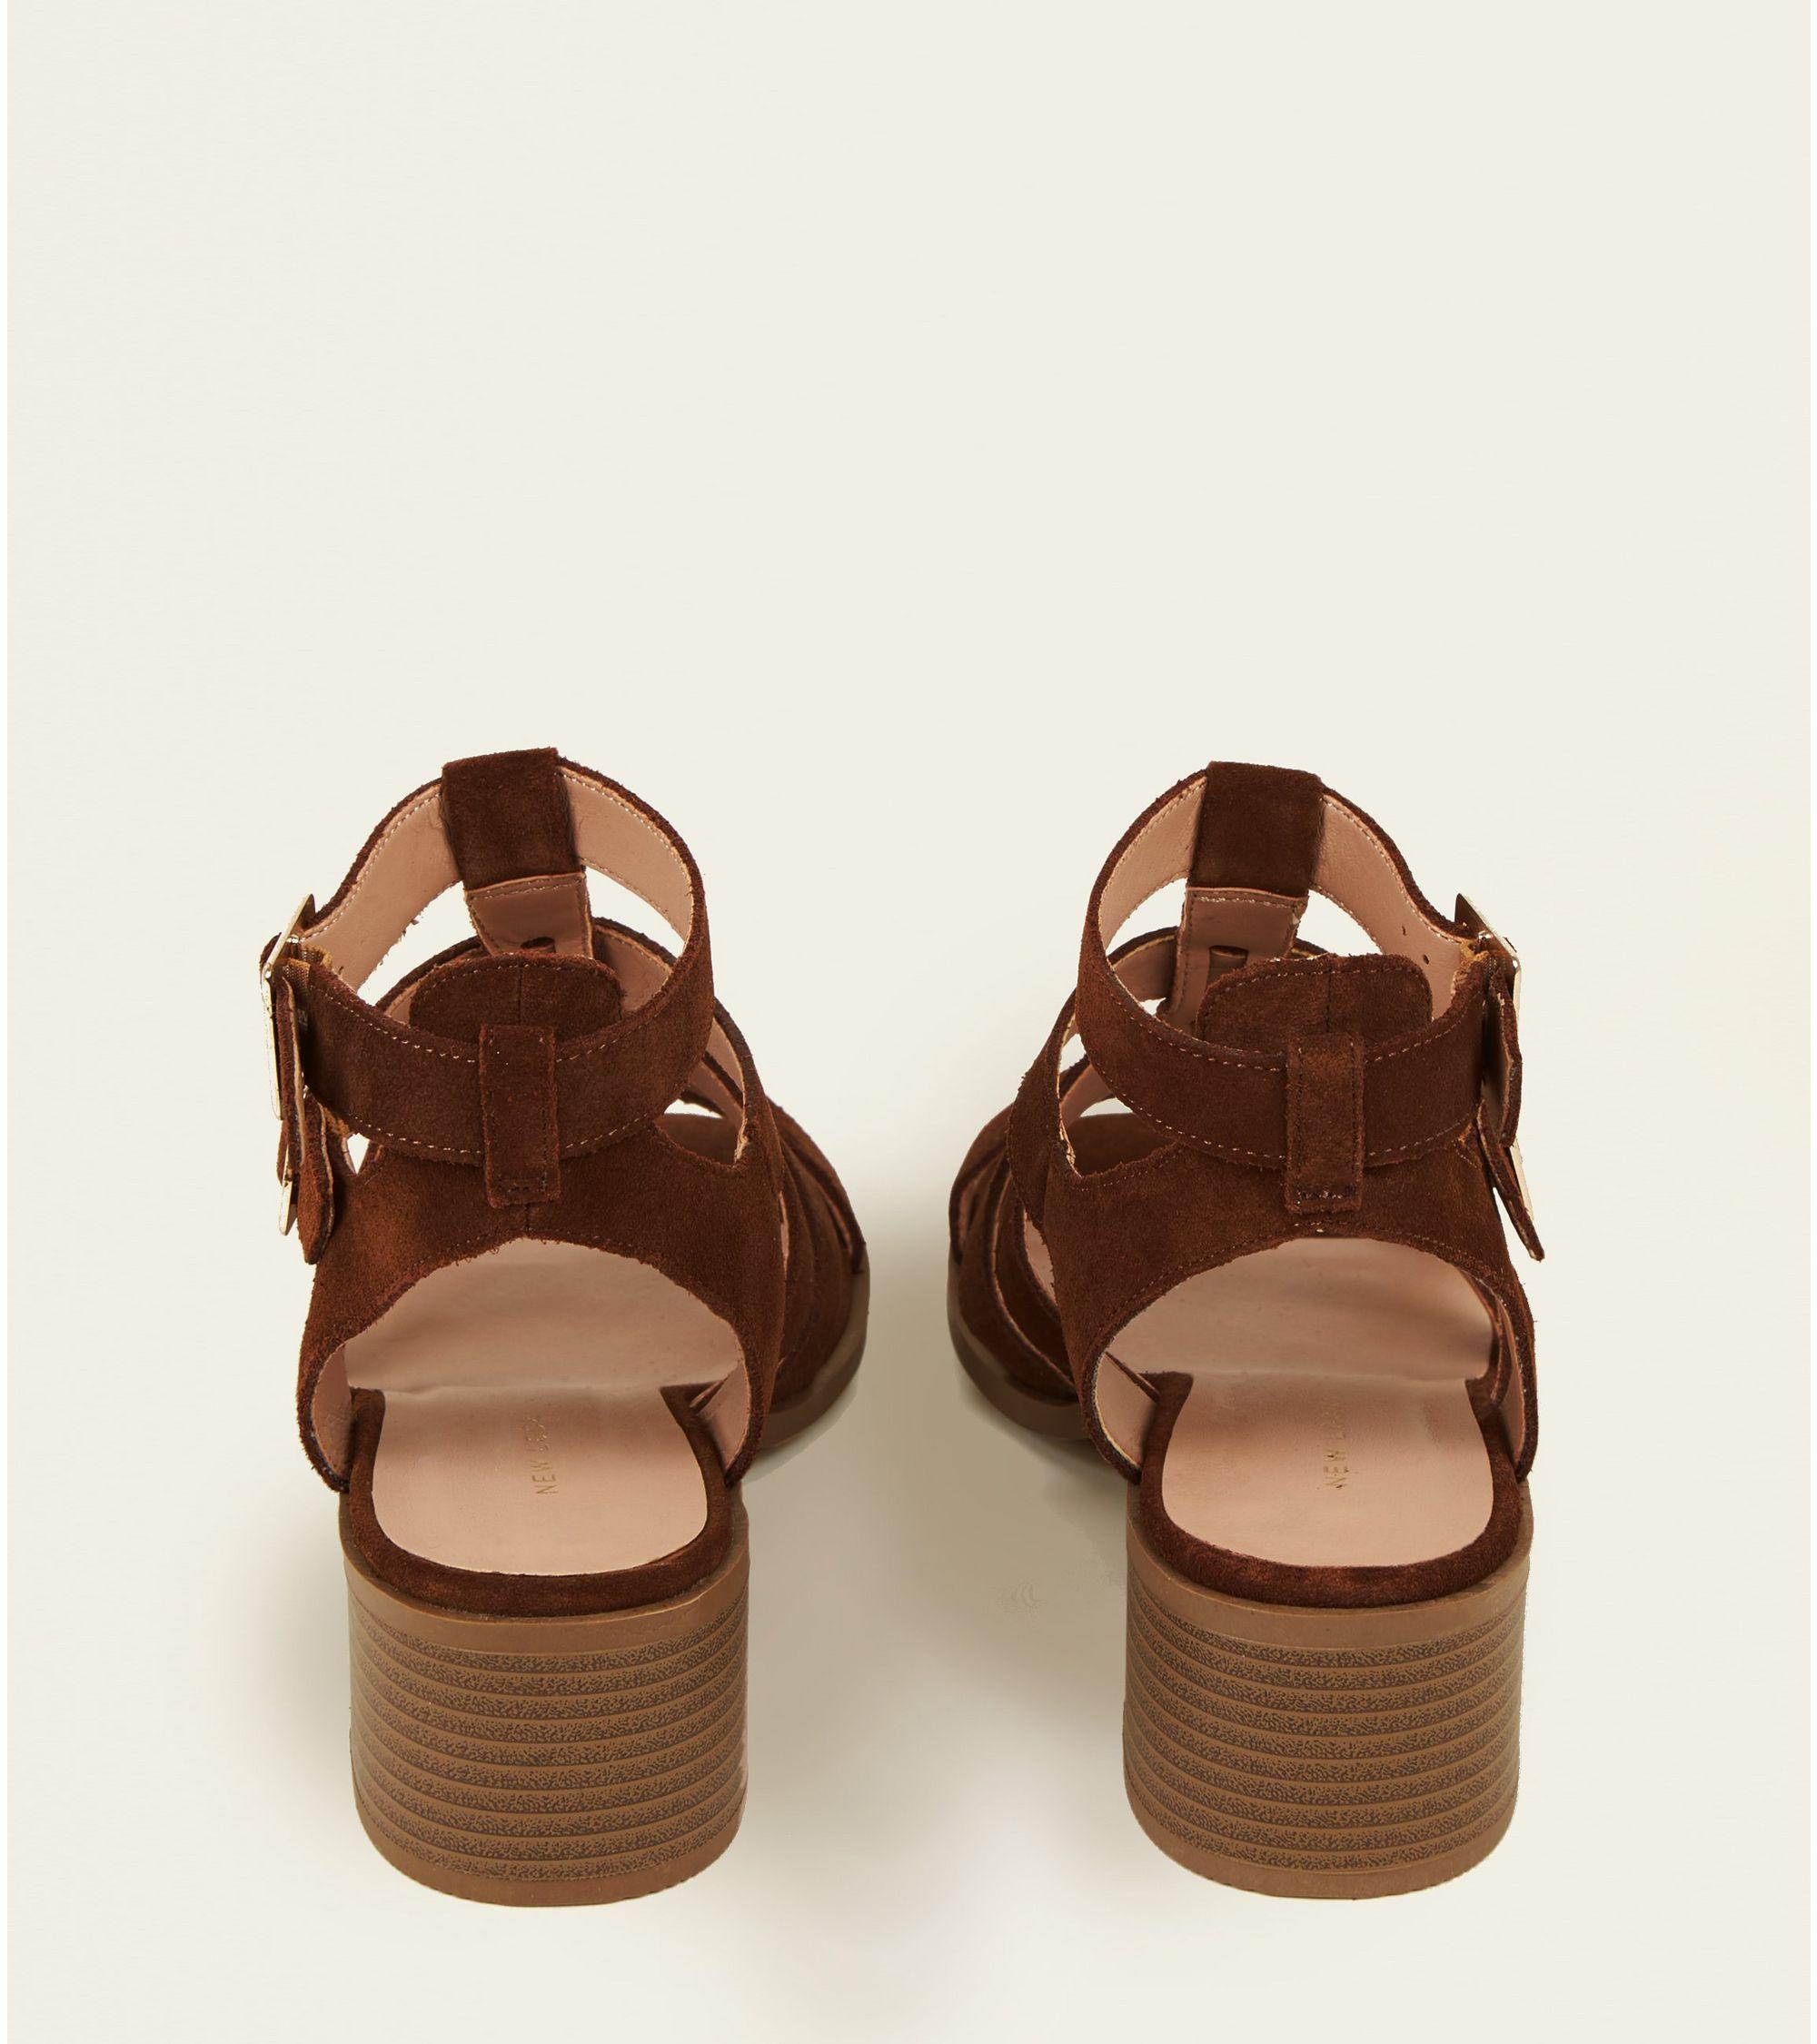 1042b8d74239 New Look Tan Suede Low Block Heel Gladiator Sandals at £12